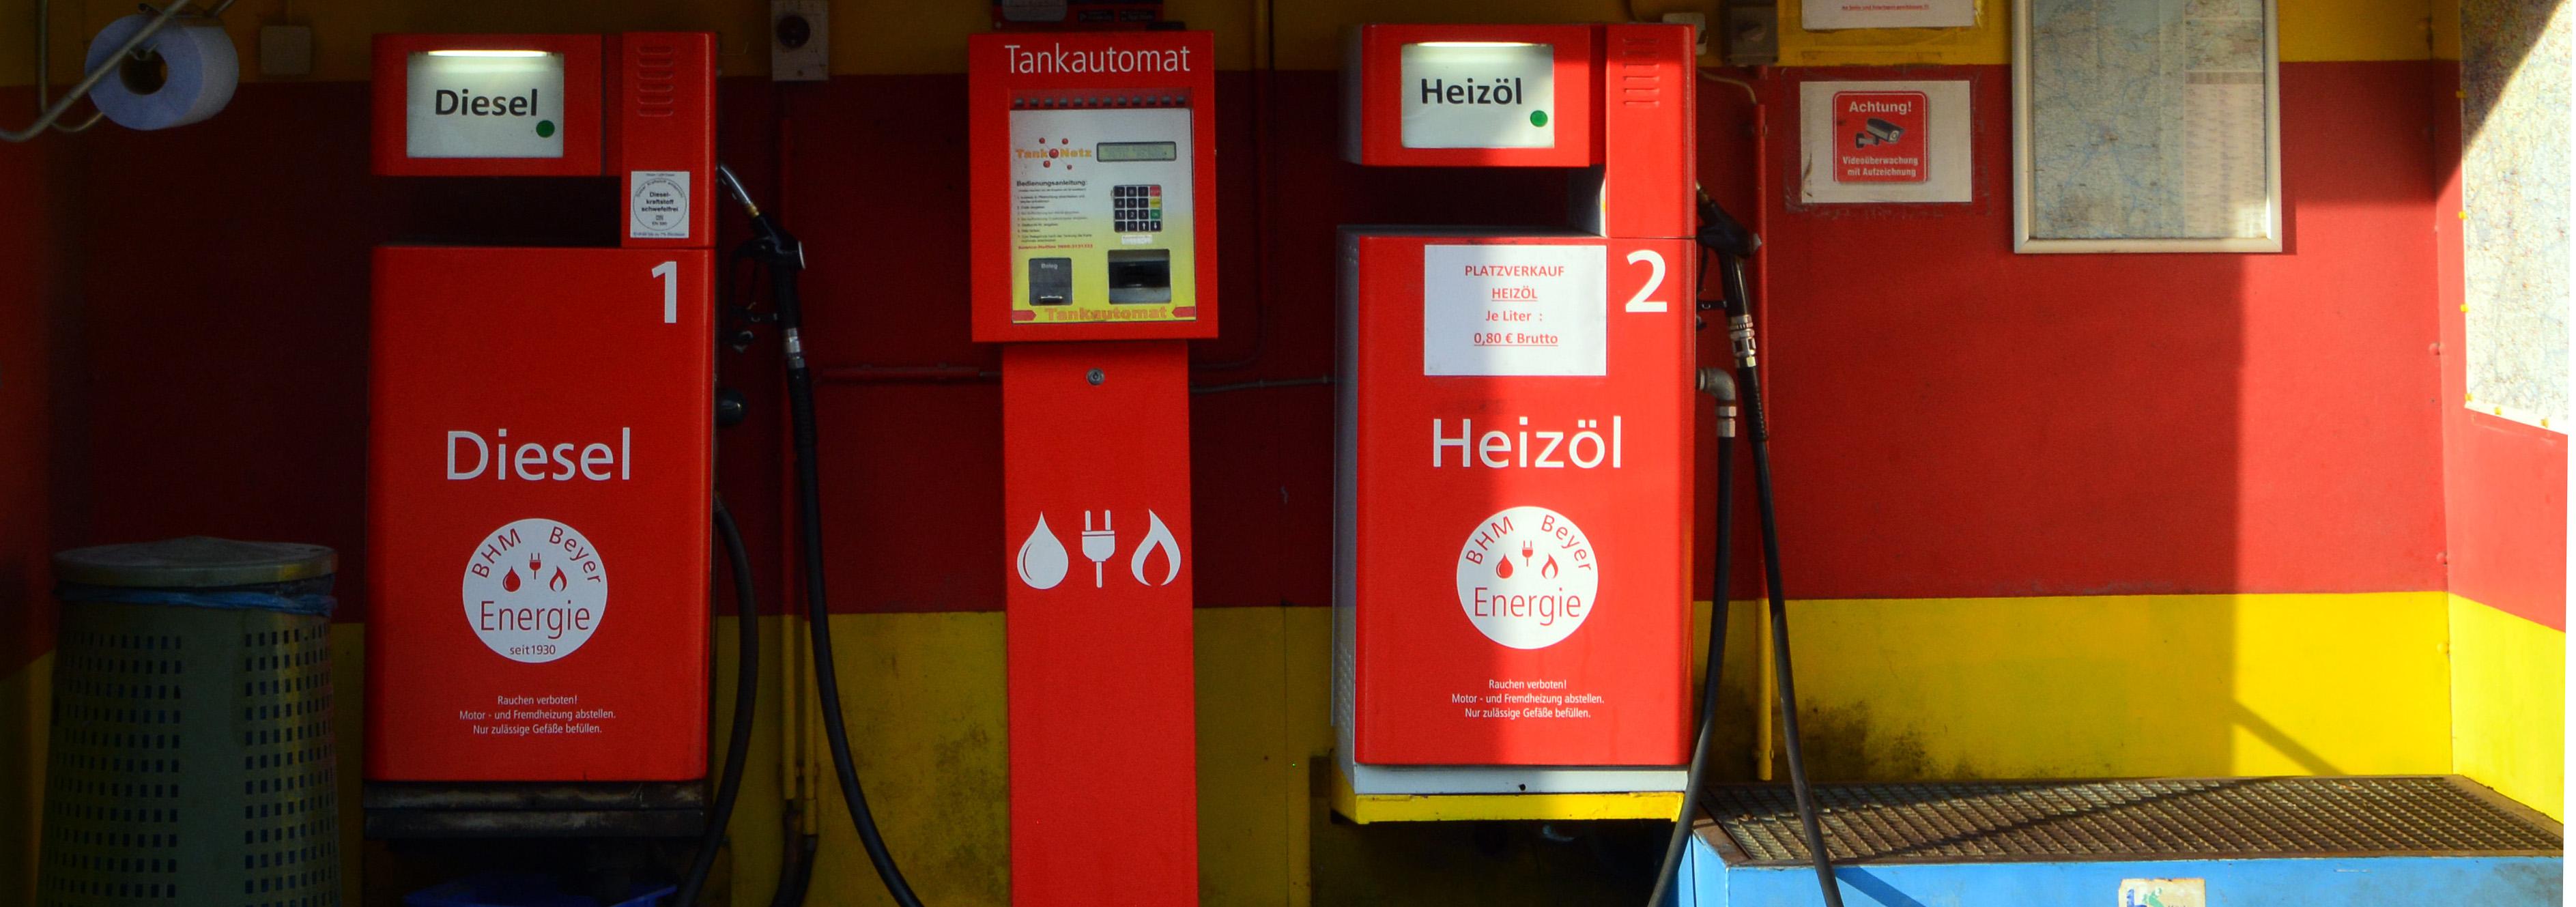 BHM Beyer Energieversorger Berlin Tanksäulen